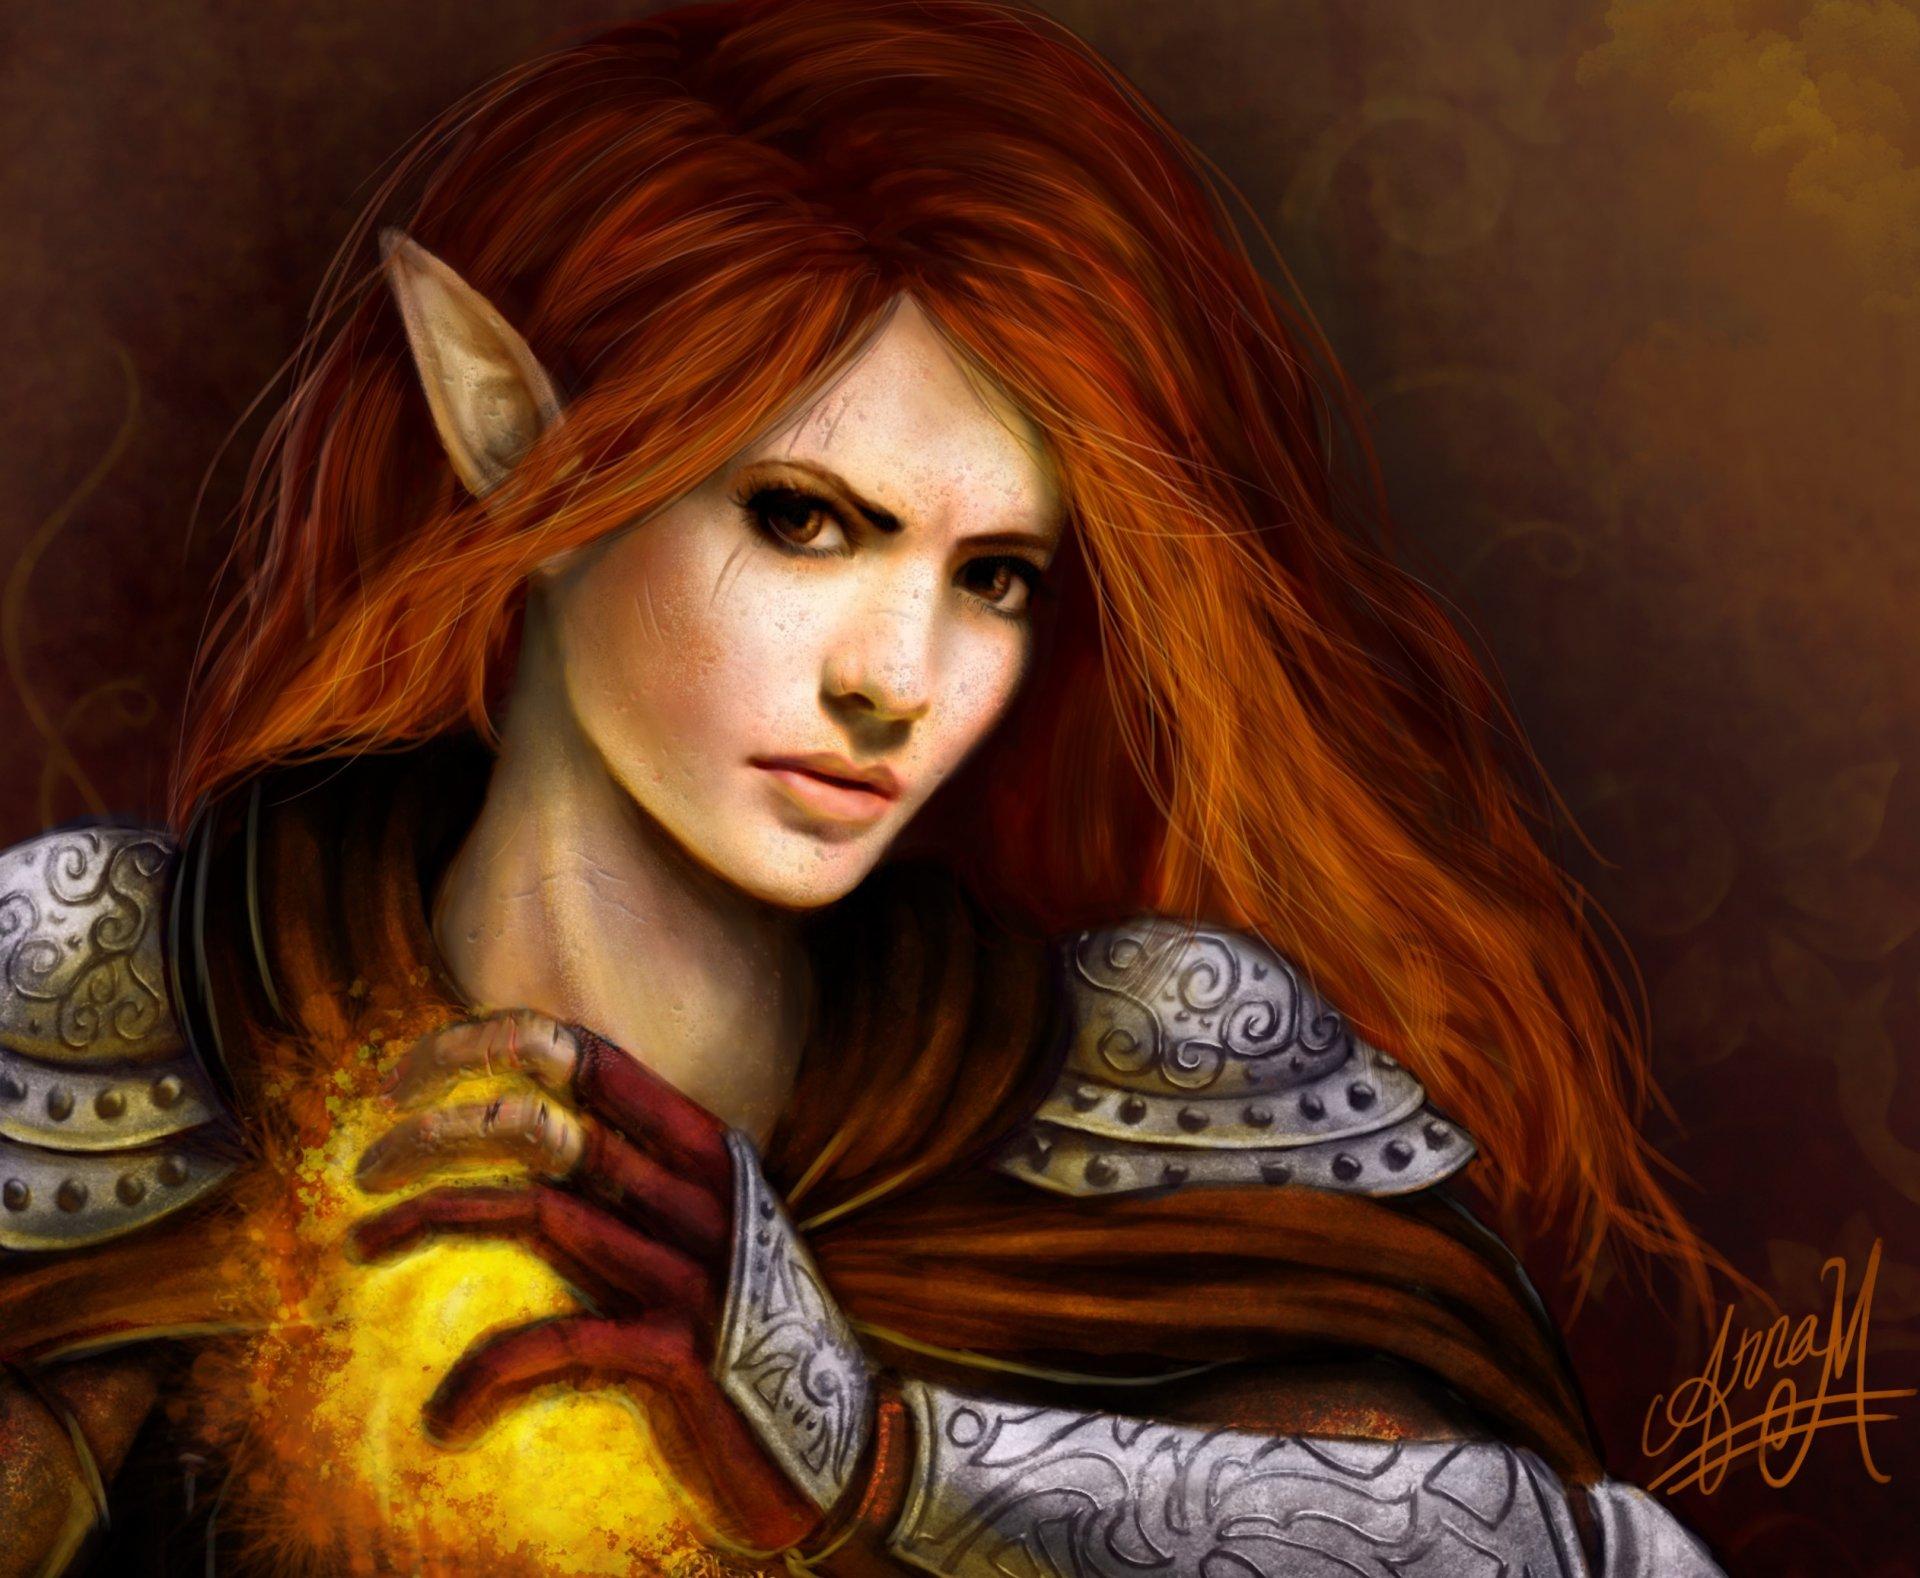 Redheaded elf girl art sexy tube